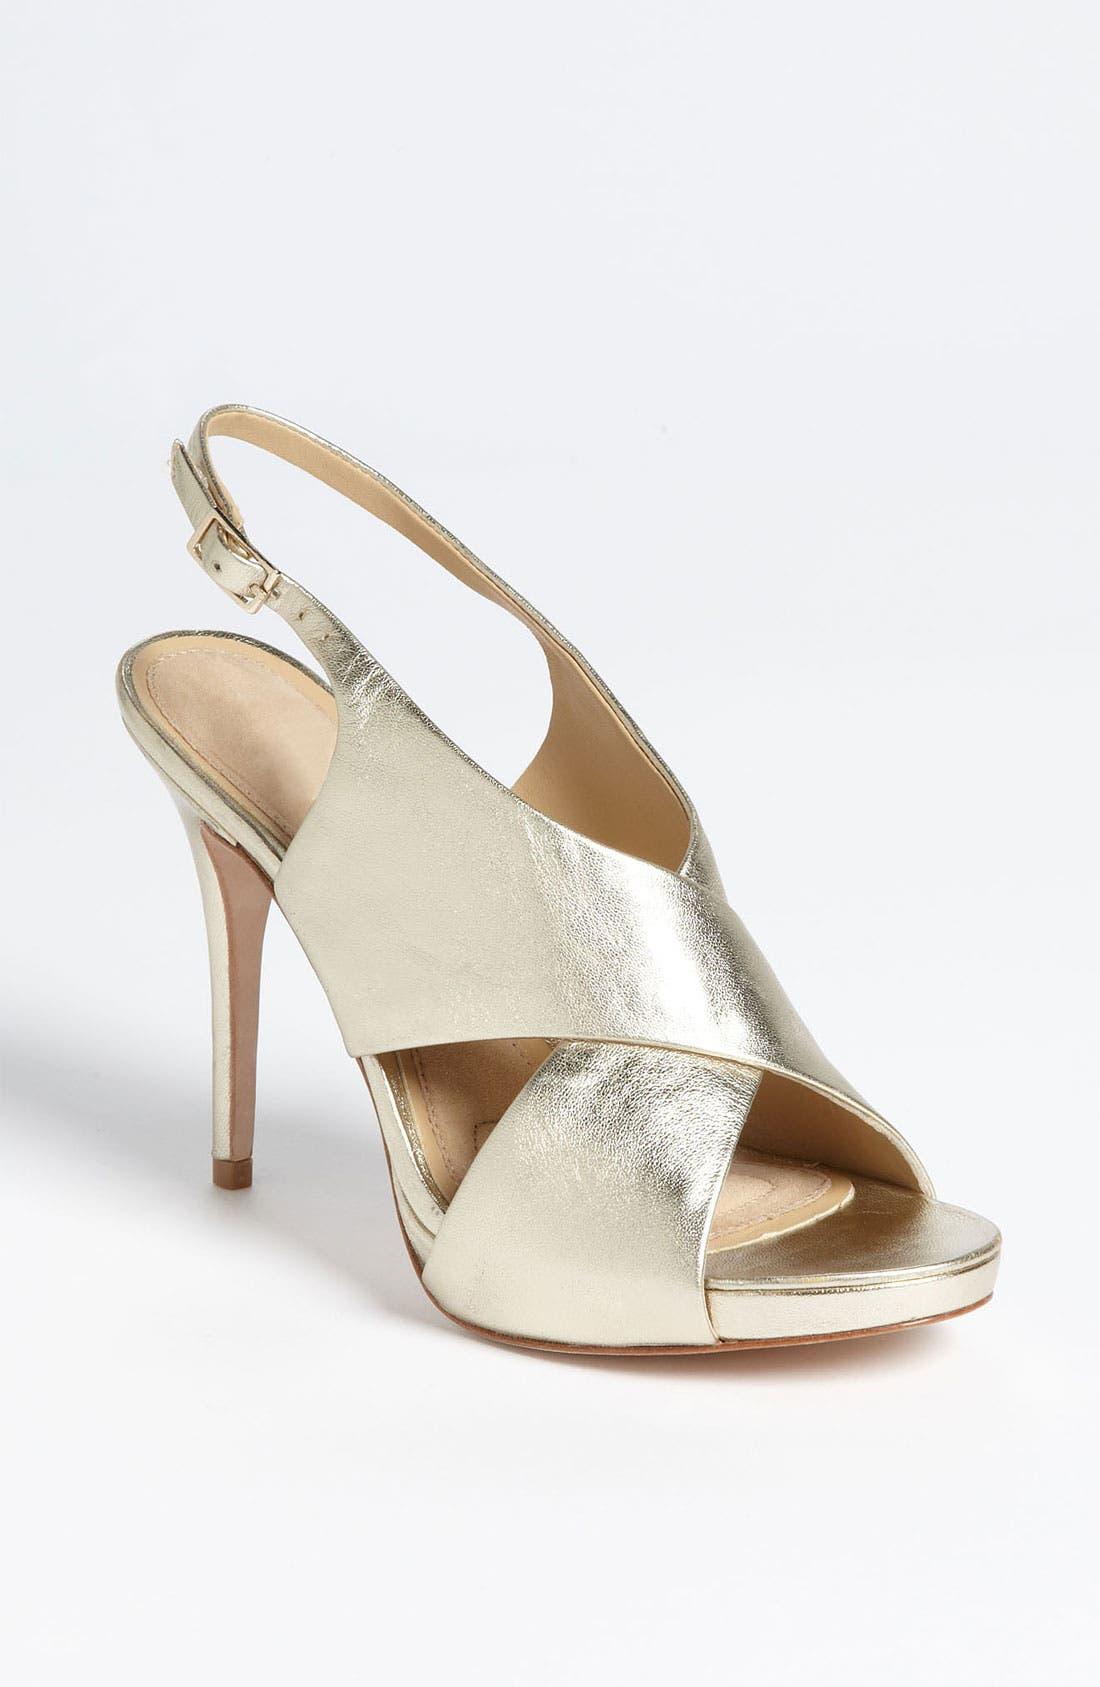 Main Image - Diane von Furstenberg 'Vada' Sandal (Online Only)